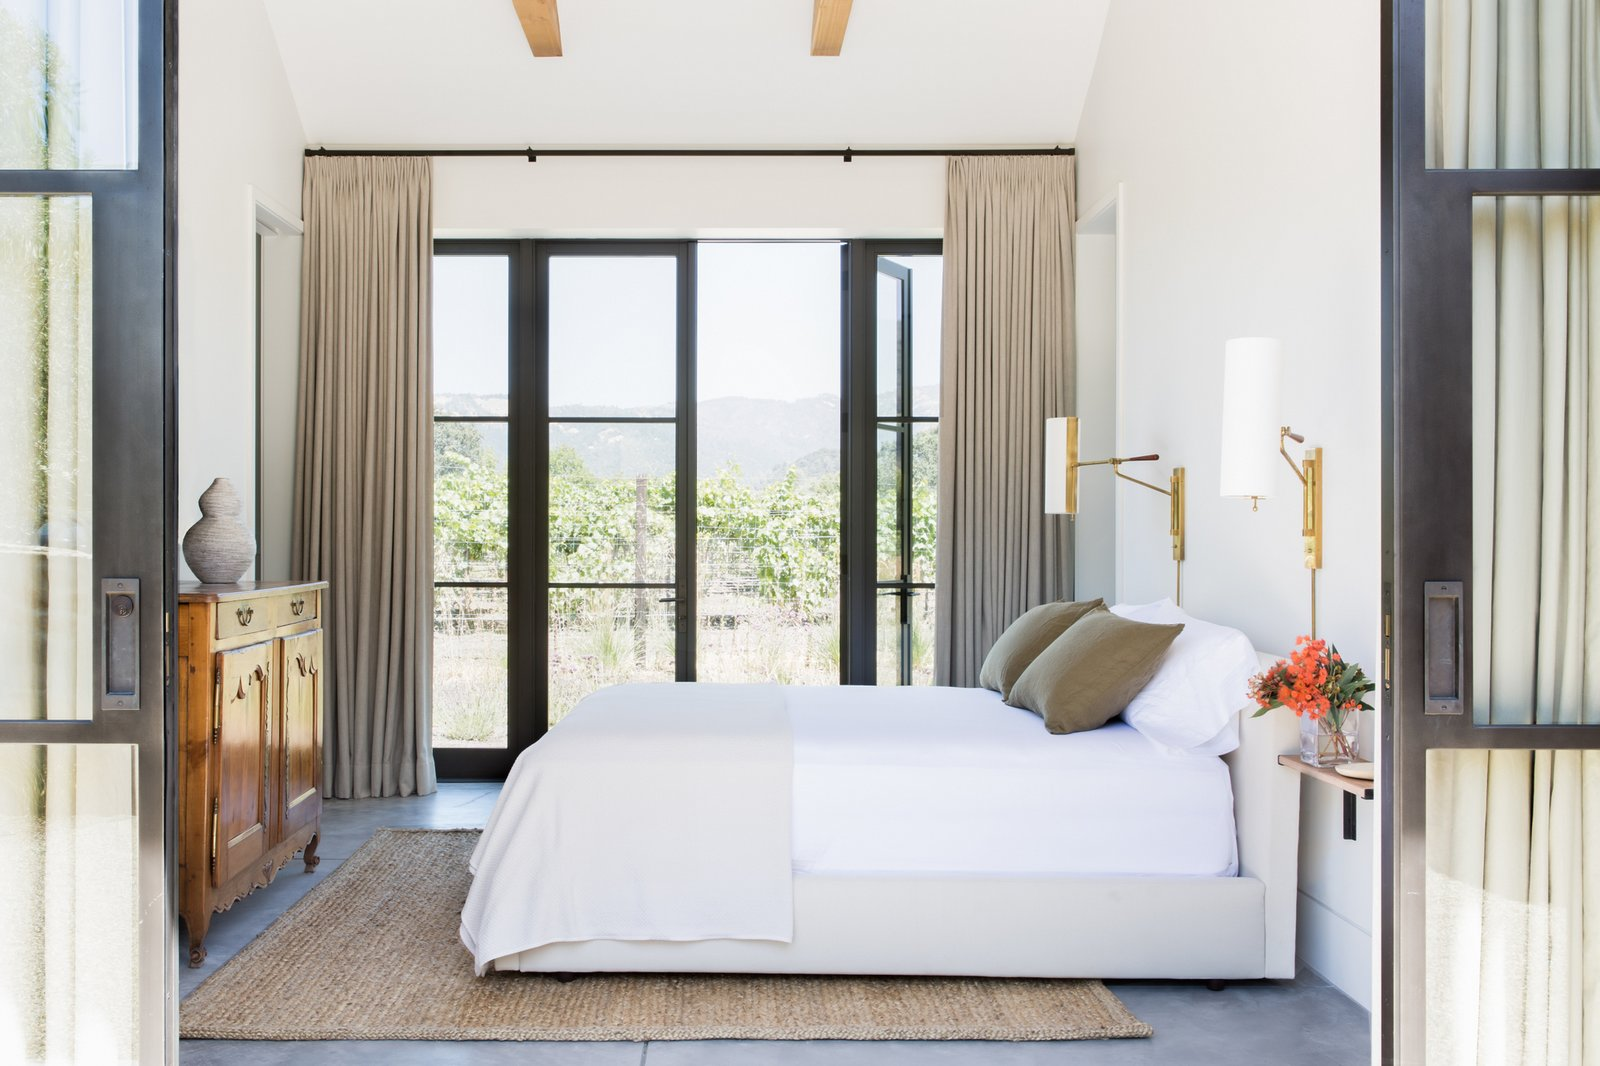 Calistoga Residence bedroom